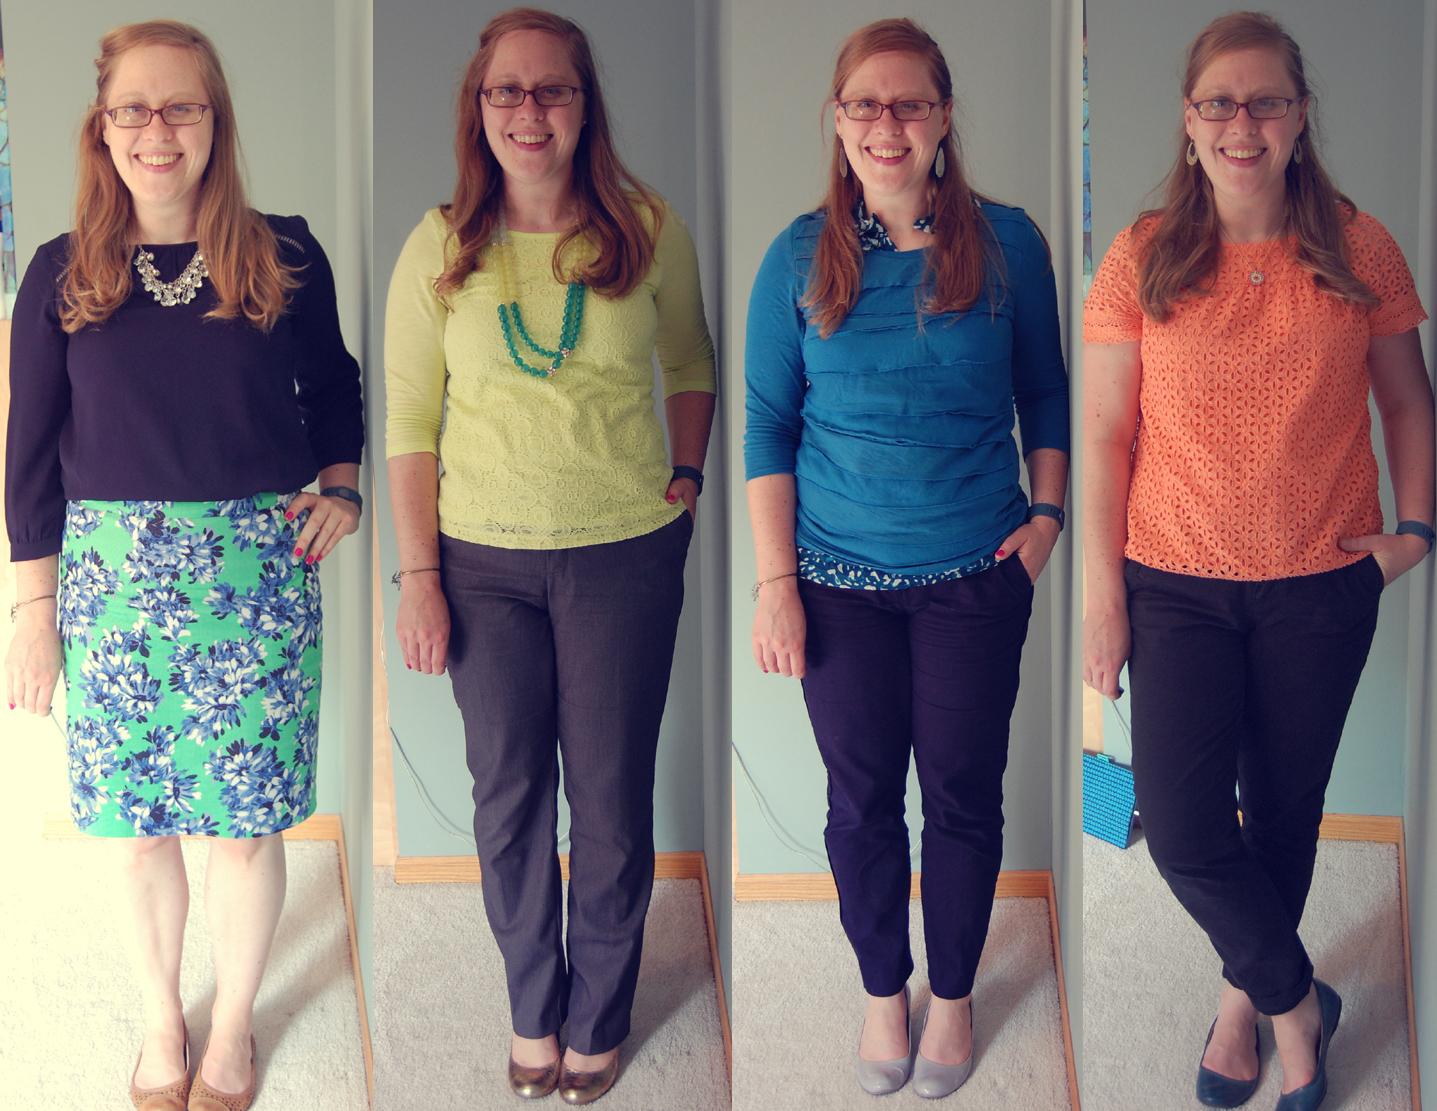 Fashion week Stylish and literate blogspot for woman